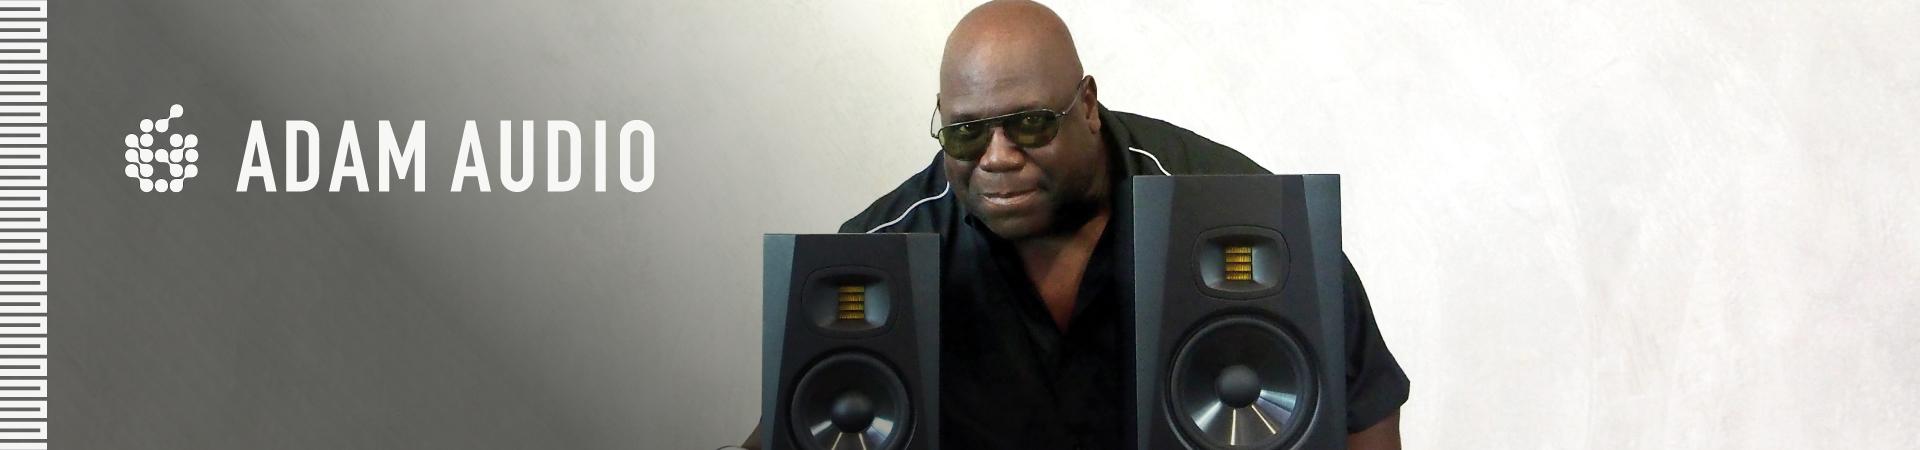 Monitory Adam Audio serii T